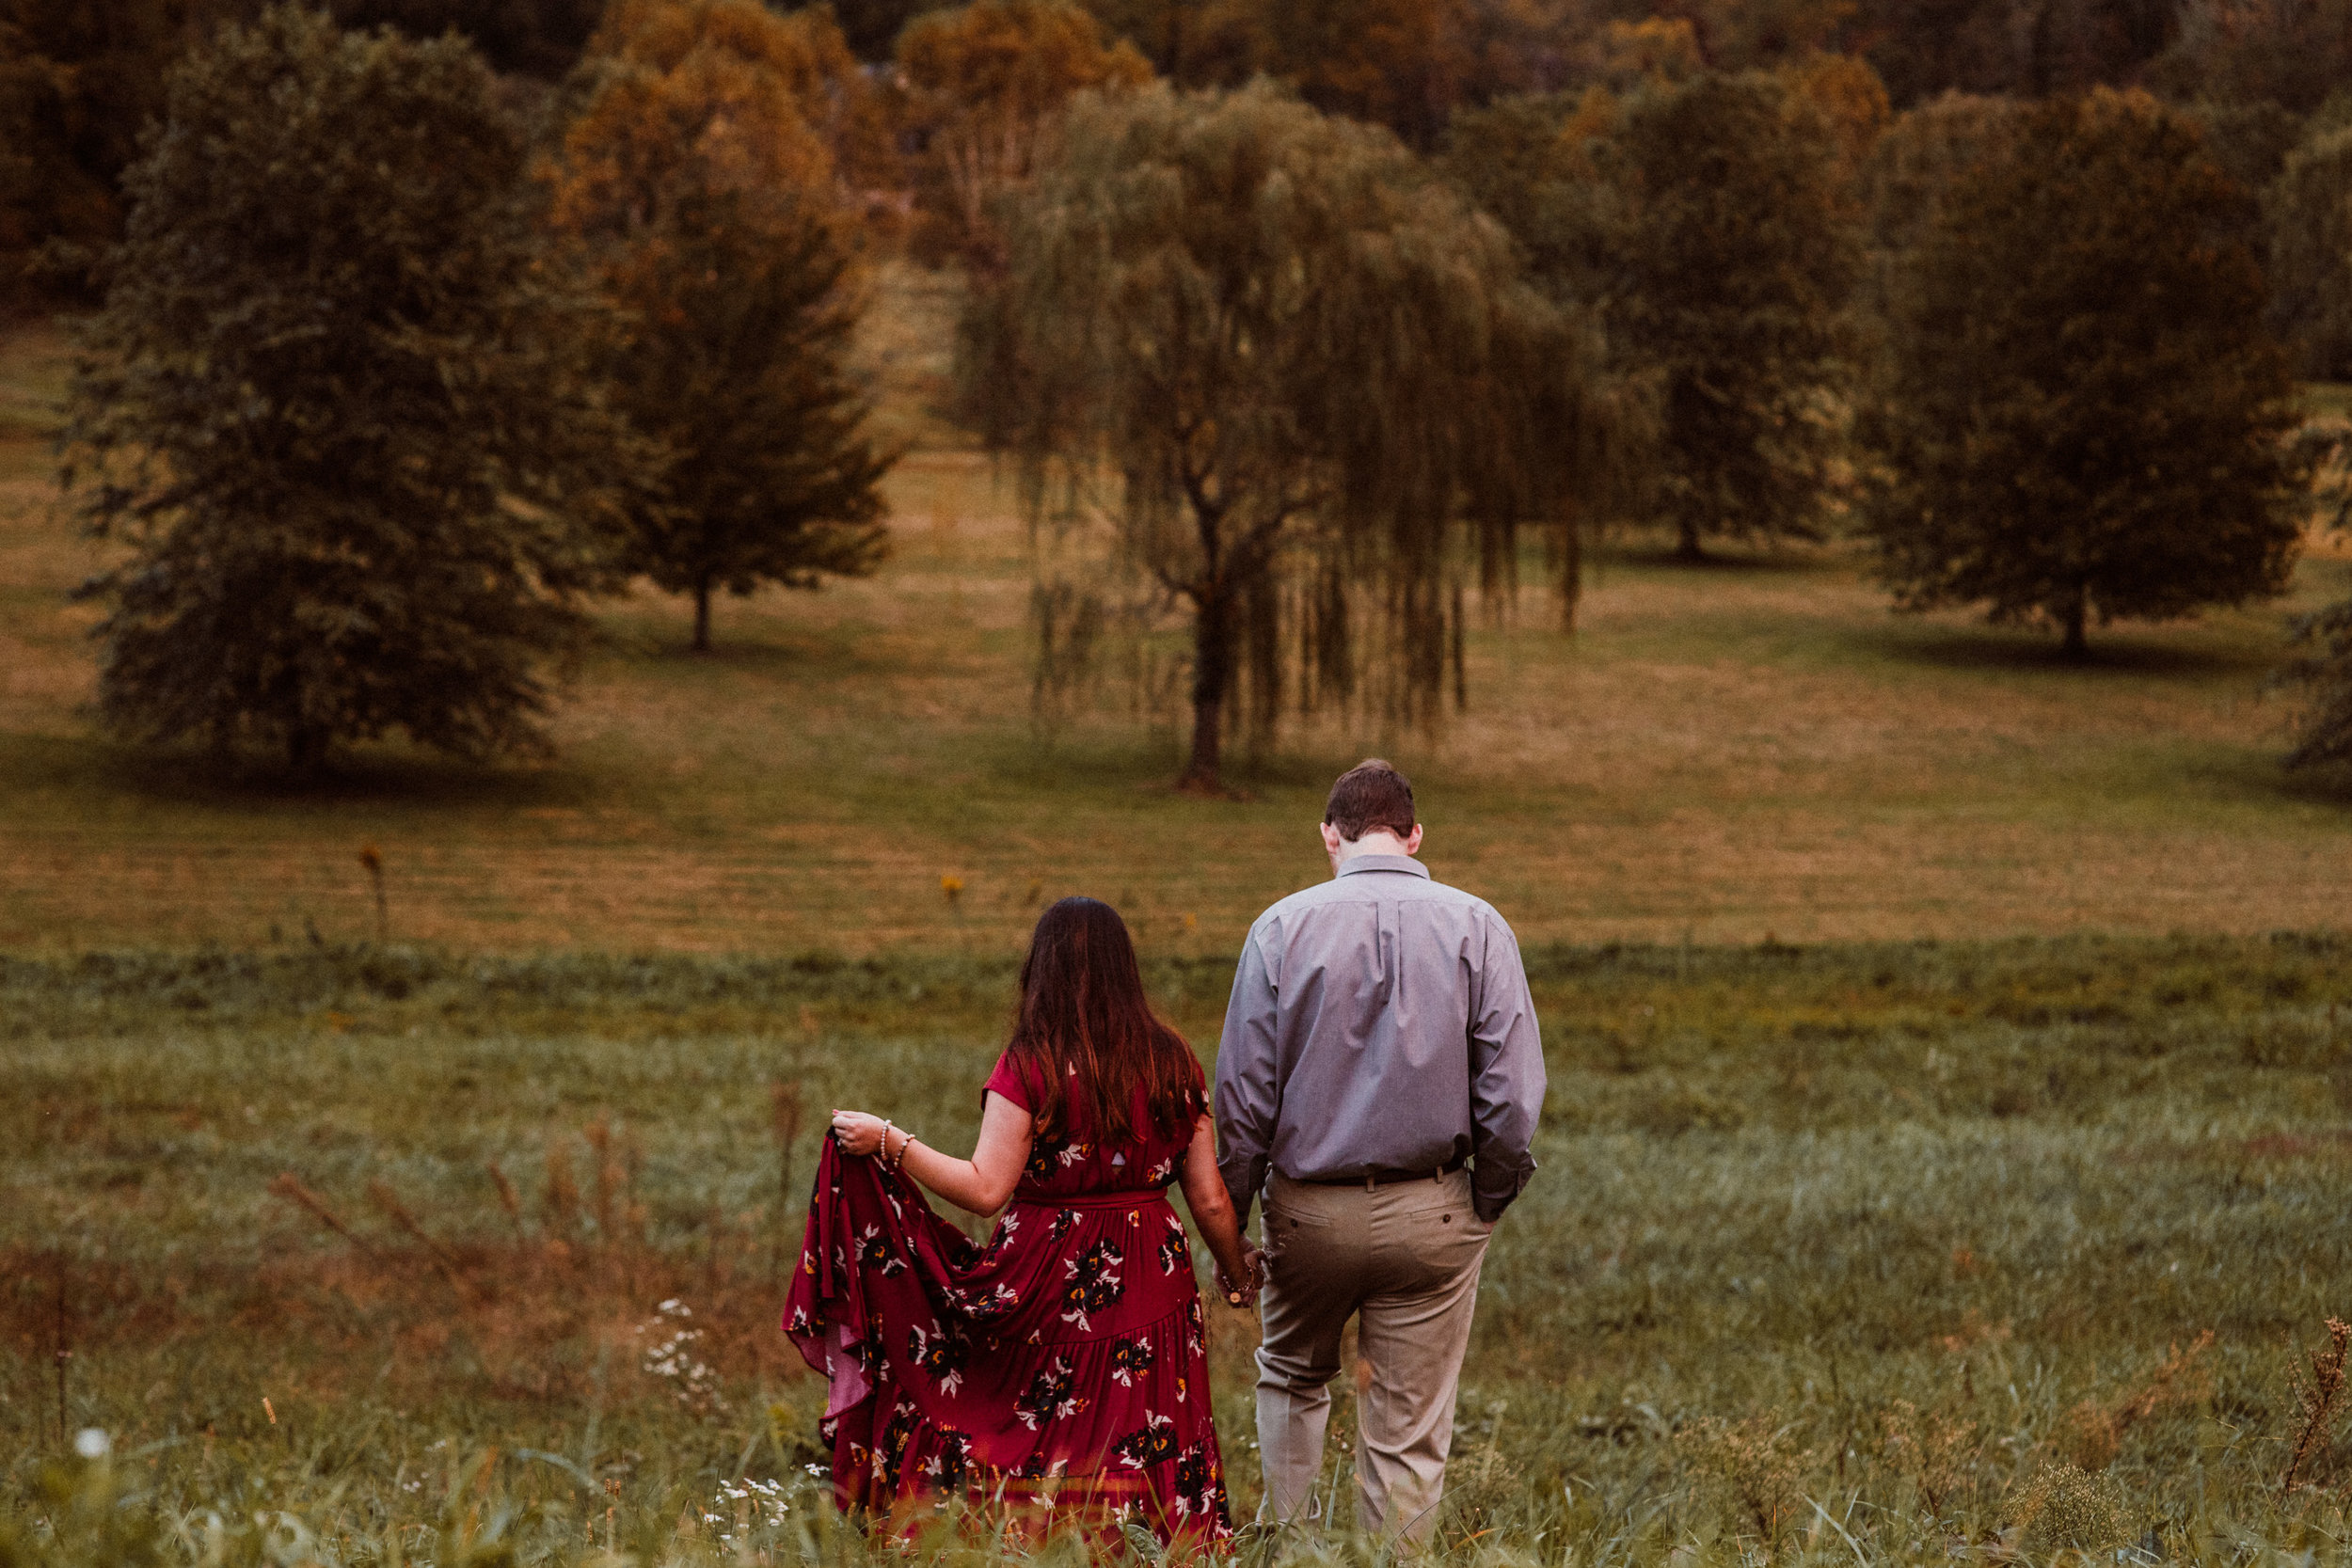 engagement-photos-near-me.jpg